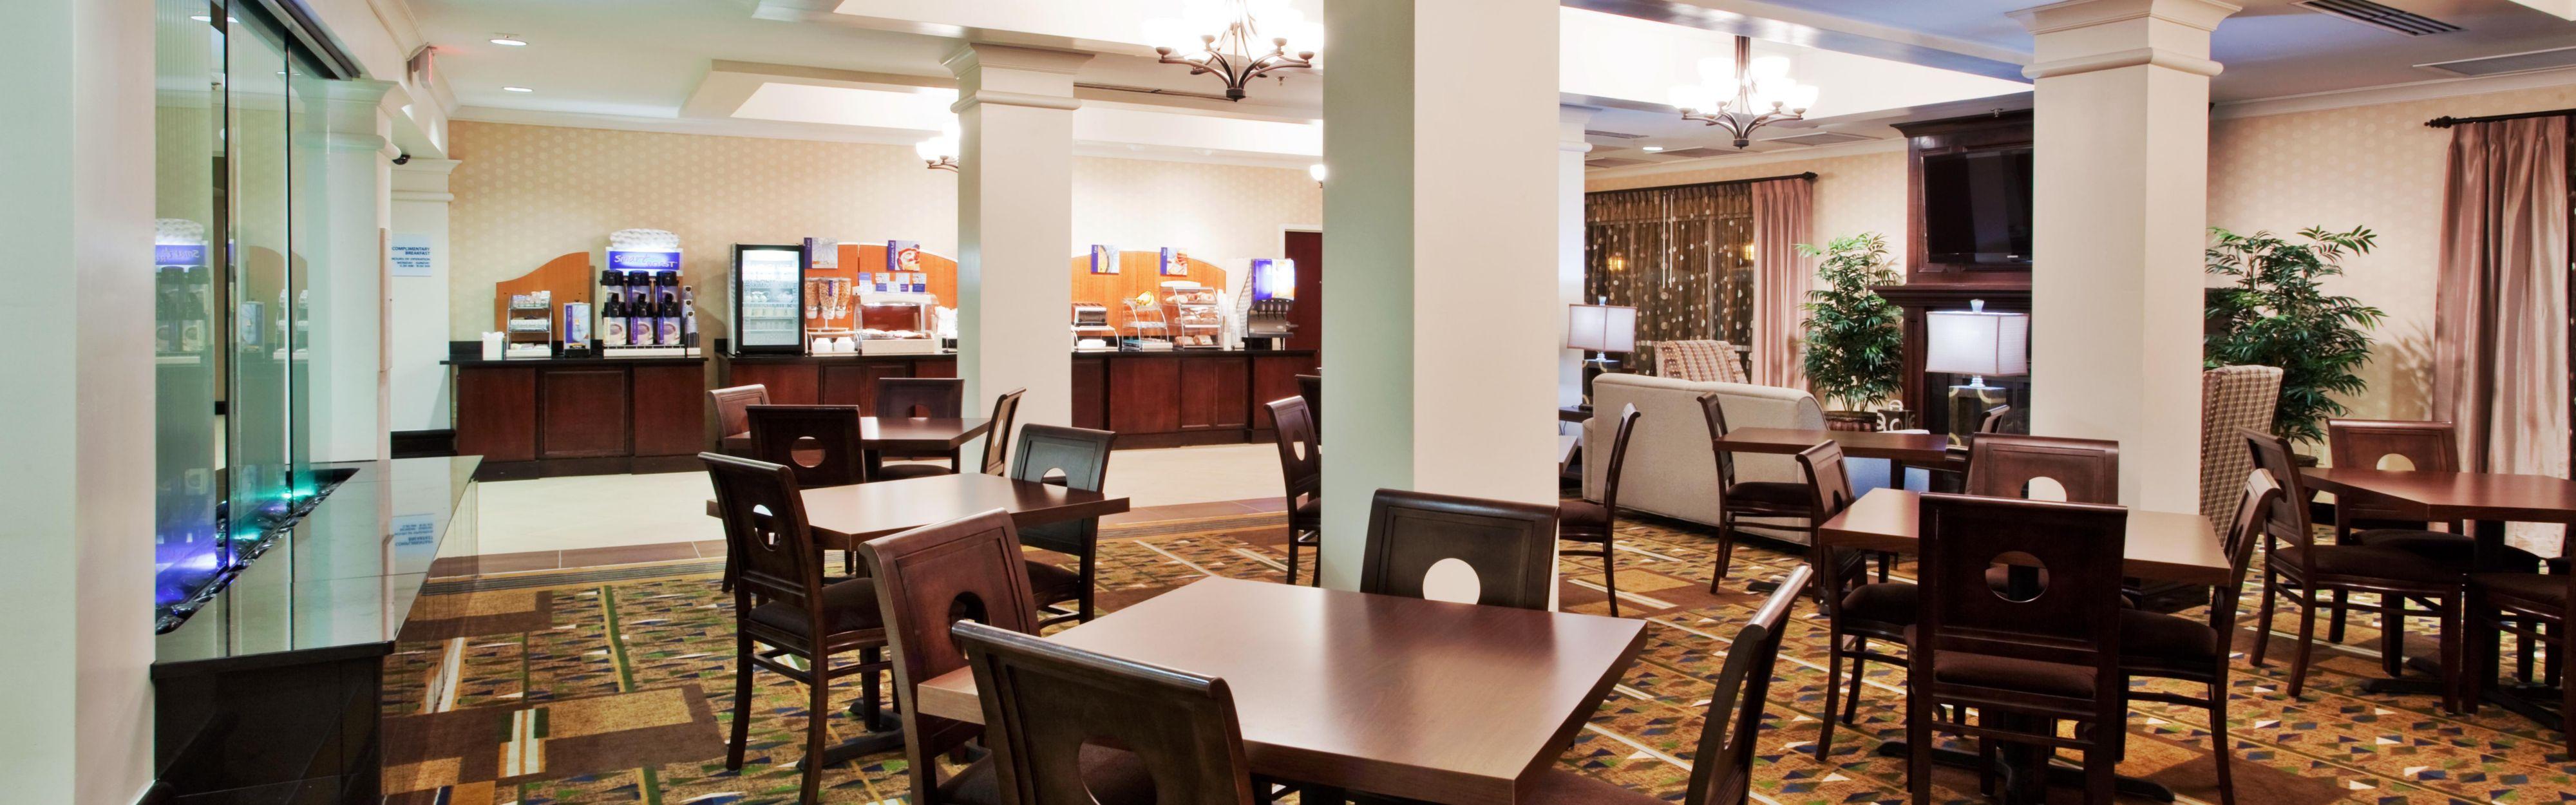 Holiday Inn Express & Suites Columbus-Fort Benning image 3